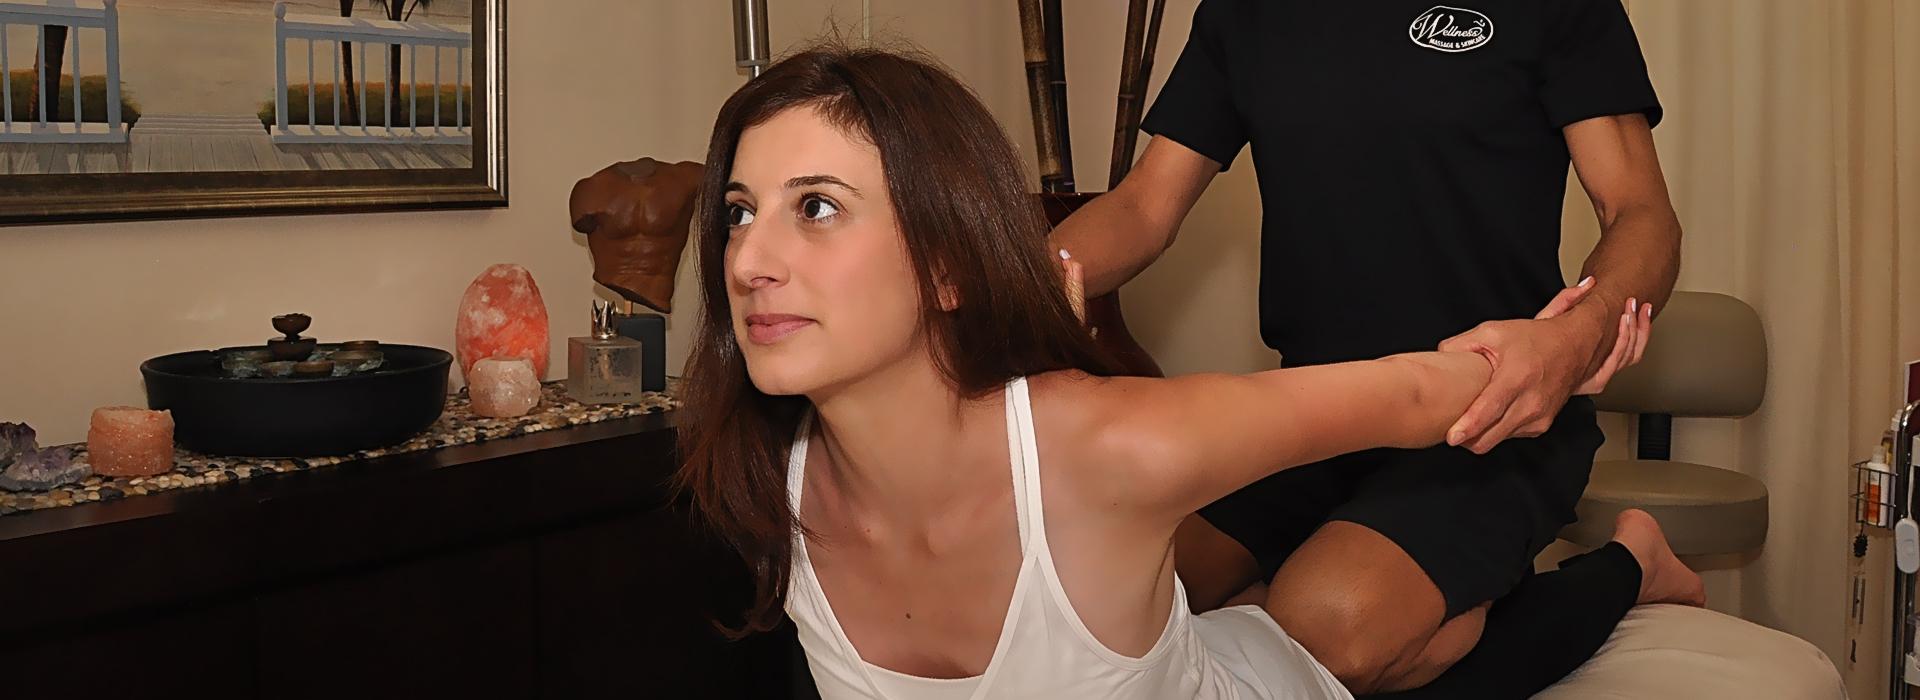 massage and skincare center Boston